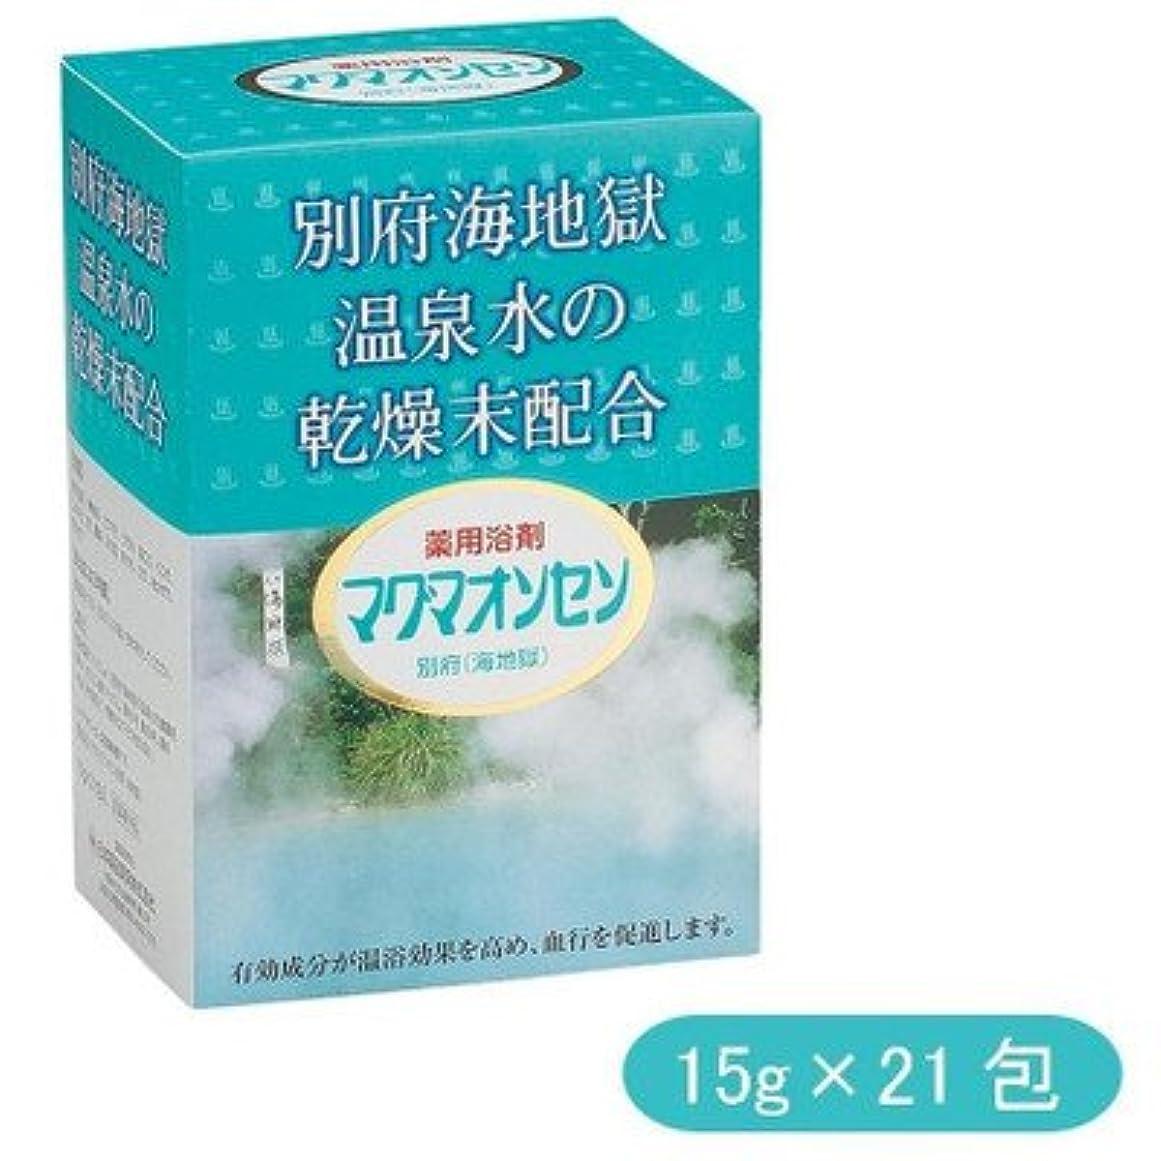 旧正月穀物数学者日本薬品開発 医薬部外品 薬用入浴剤 マグマオンセン 15g×21P 800770